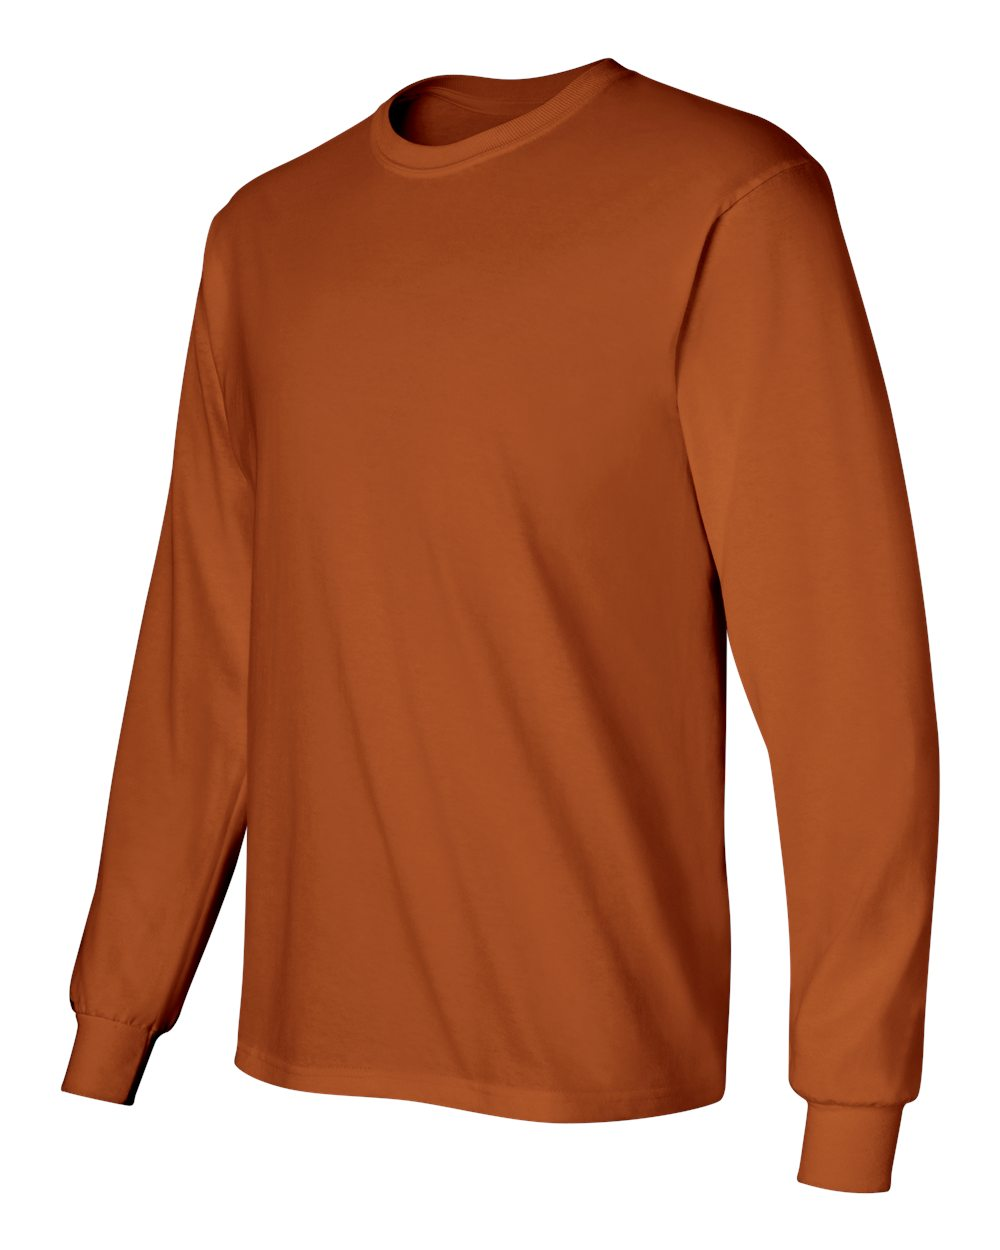 Gildan-Men-039-s-Ultra-Cotton-6-oz-Long-Sleeve-T-Shirt-G240-S-5XL thumbnail 107